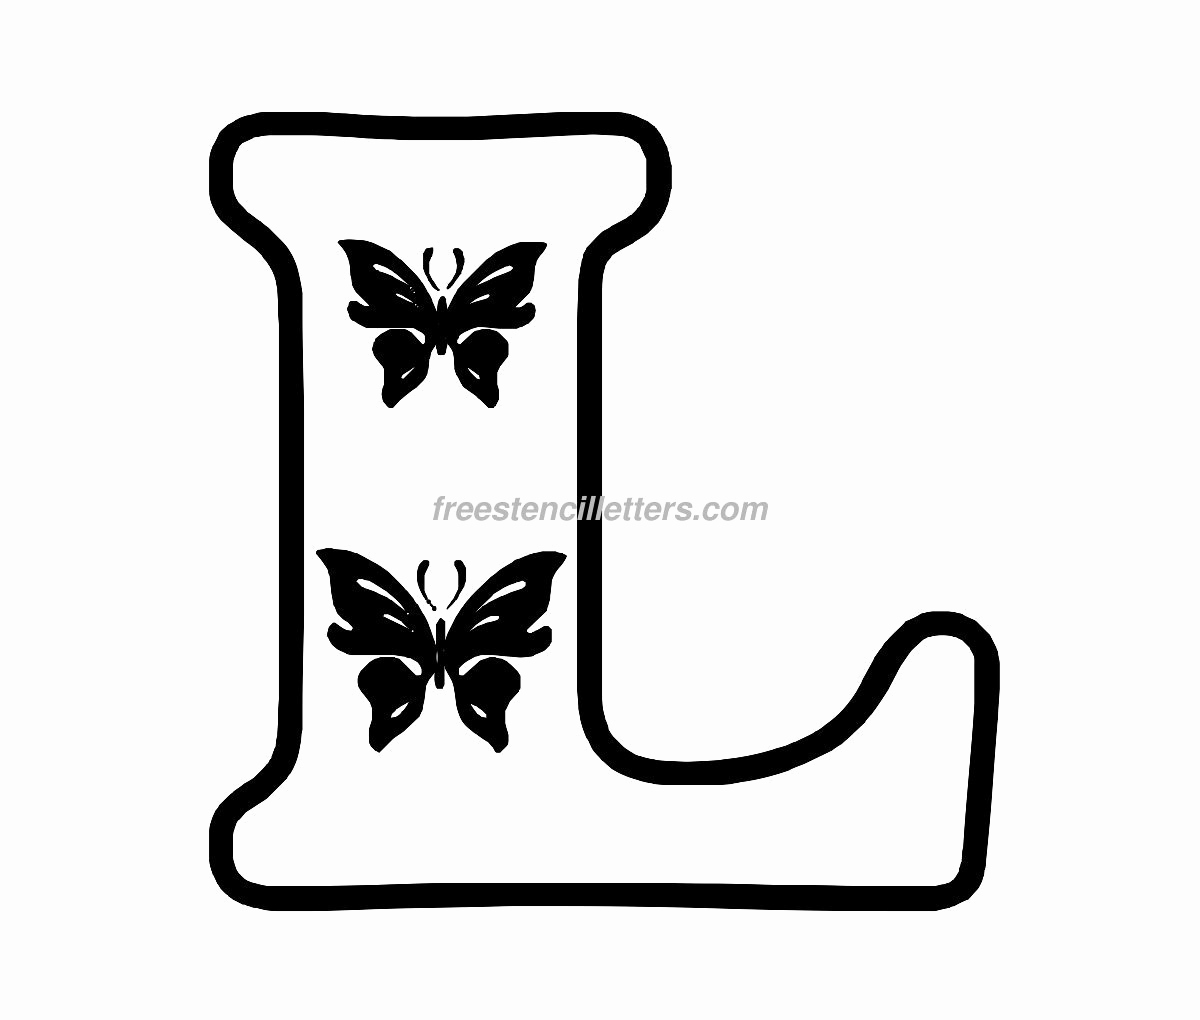 Free Printable Alphabet Stencils Elegant Print L Letter Stencil Free Stencil Letters